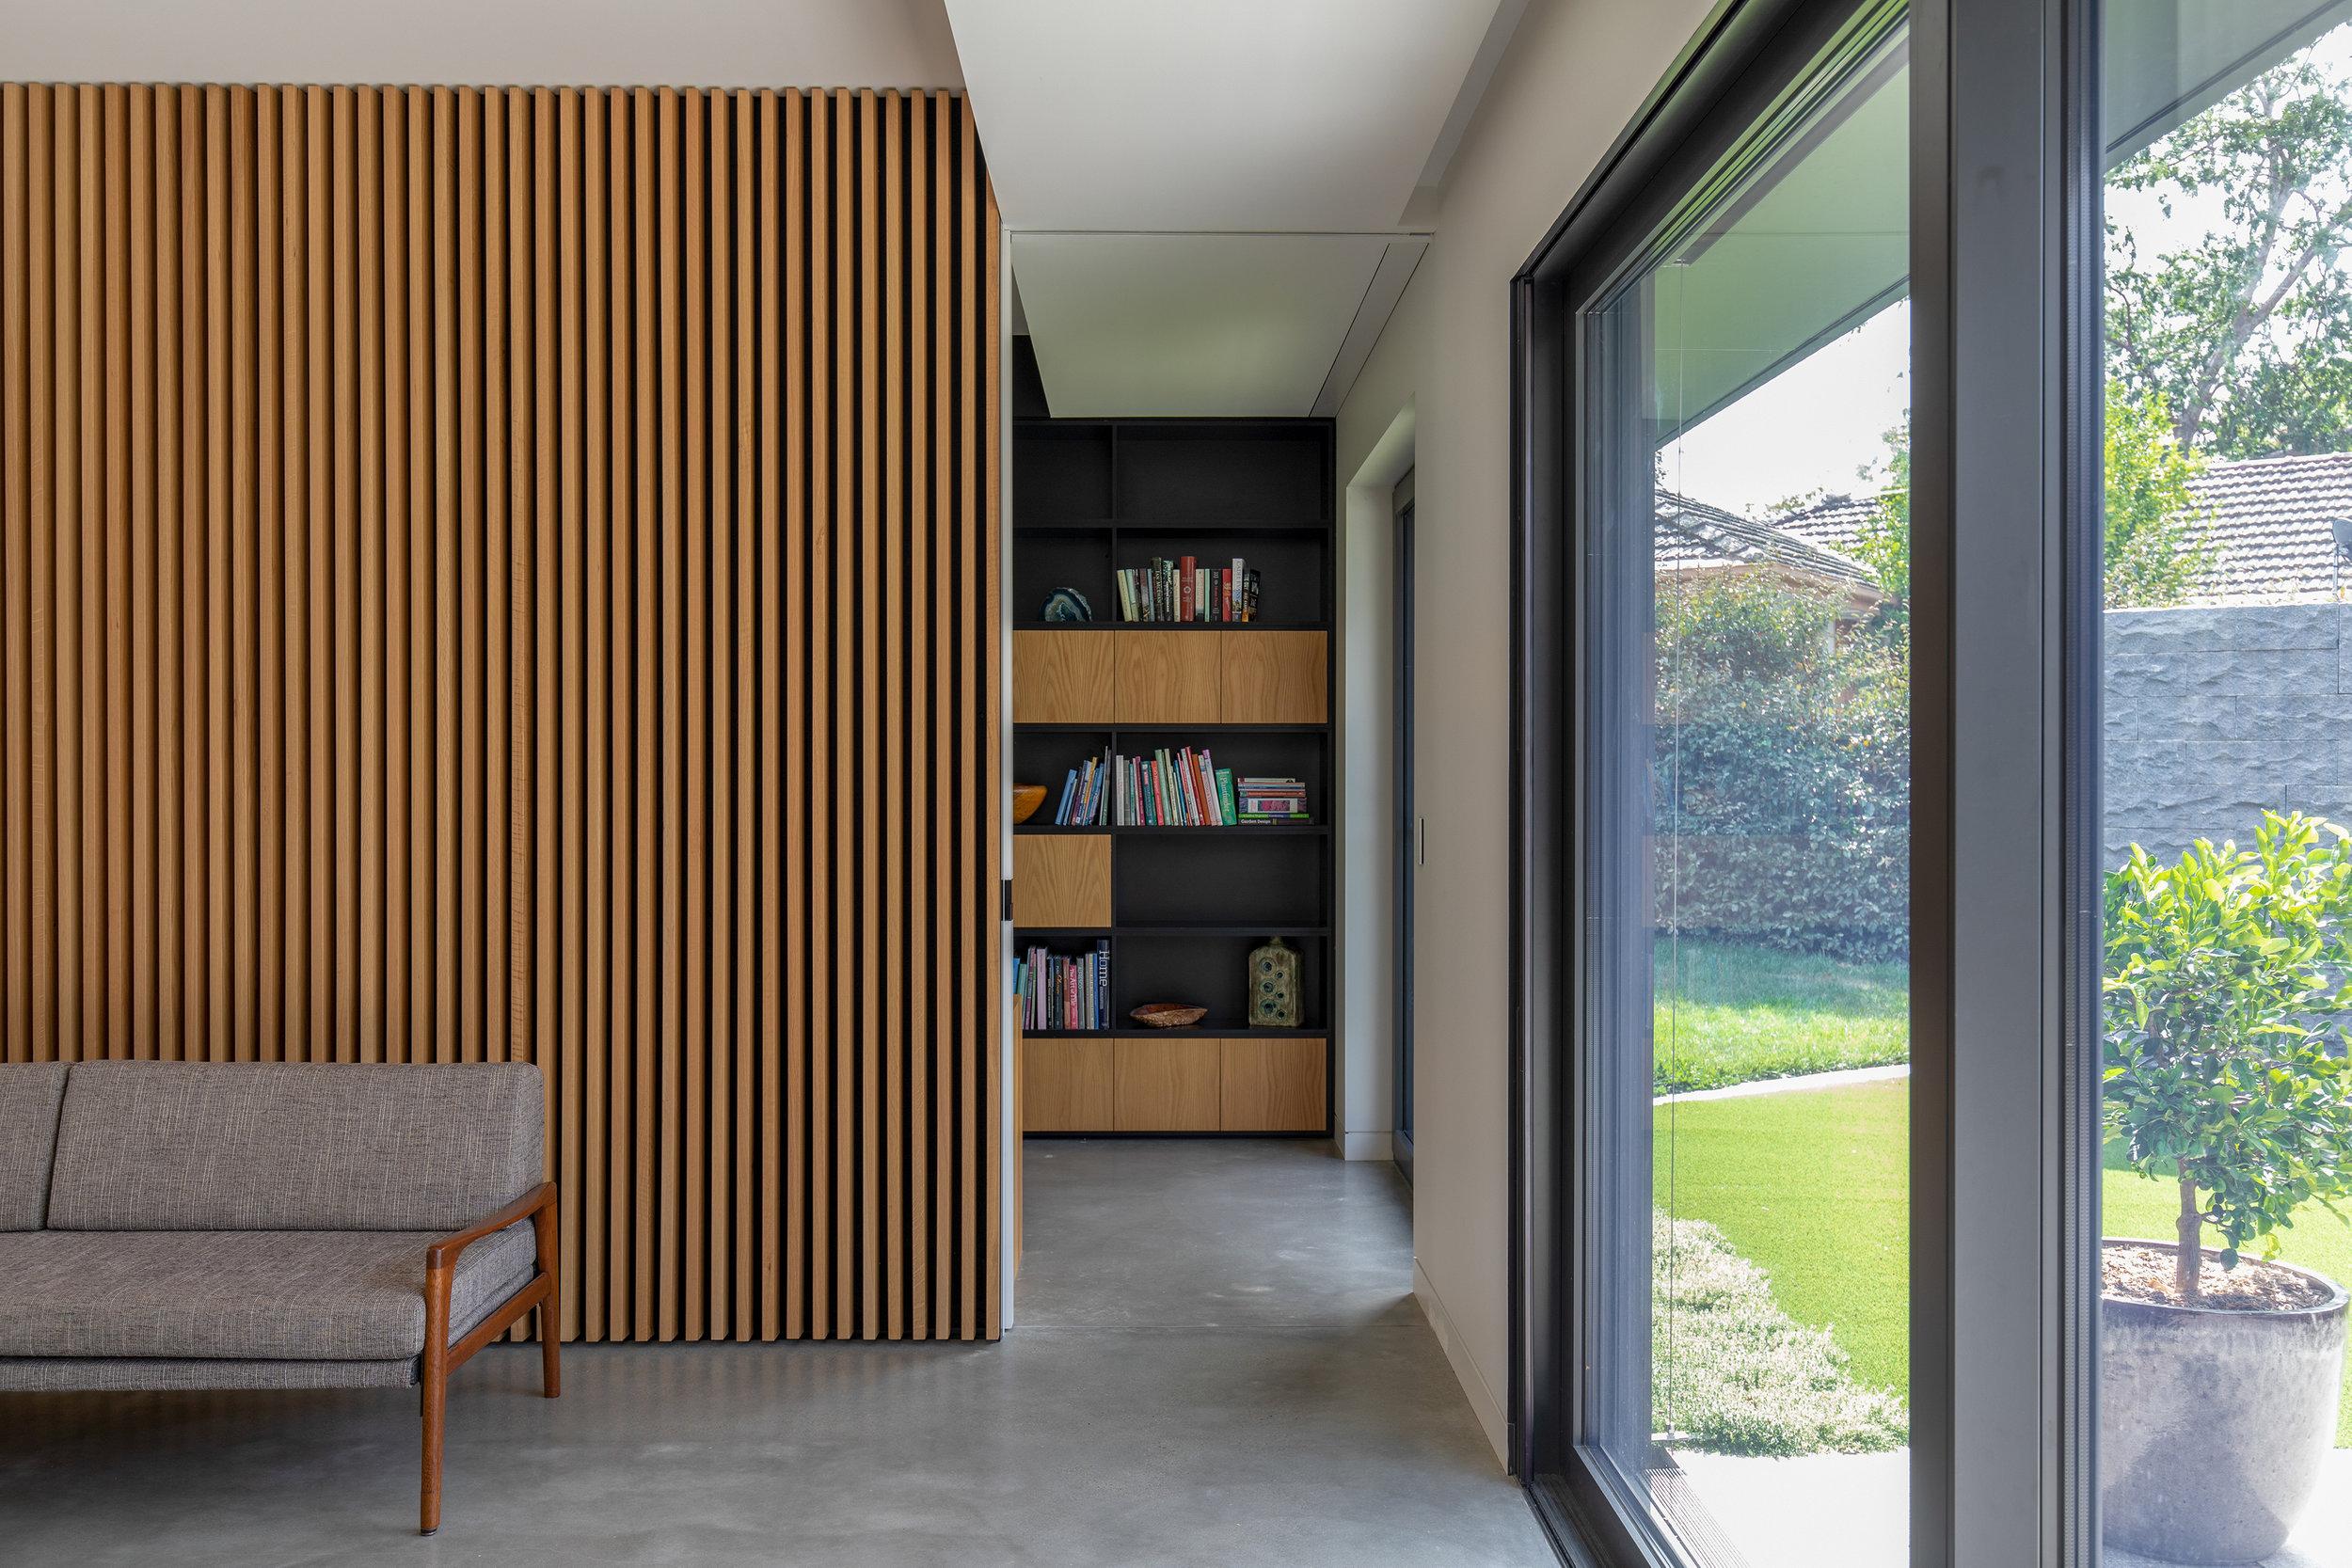 2913-resnew_Concrete House_Rob Henry Architects_Light Studies_08.jpg